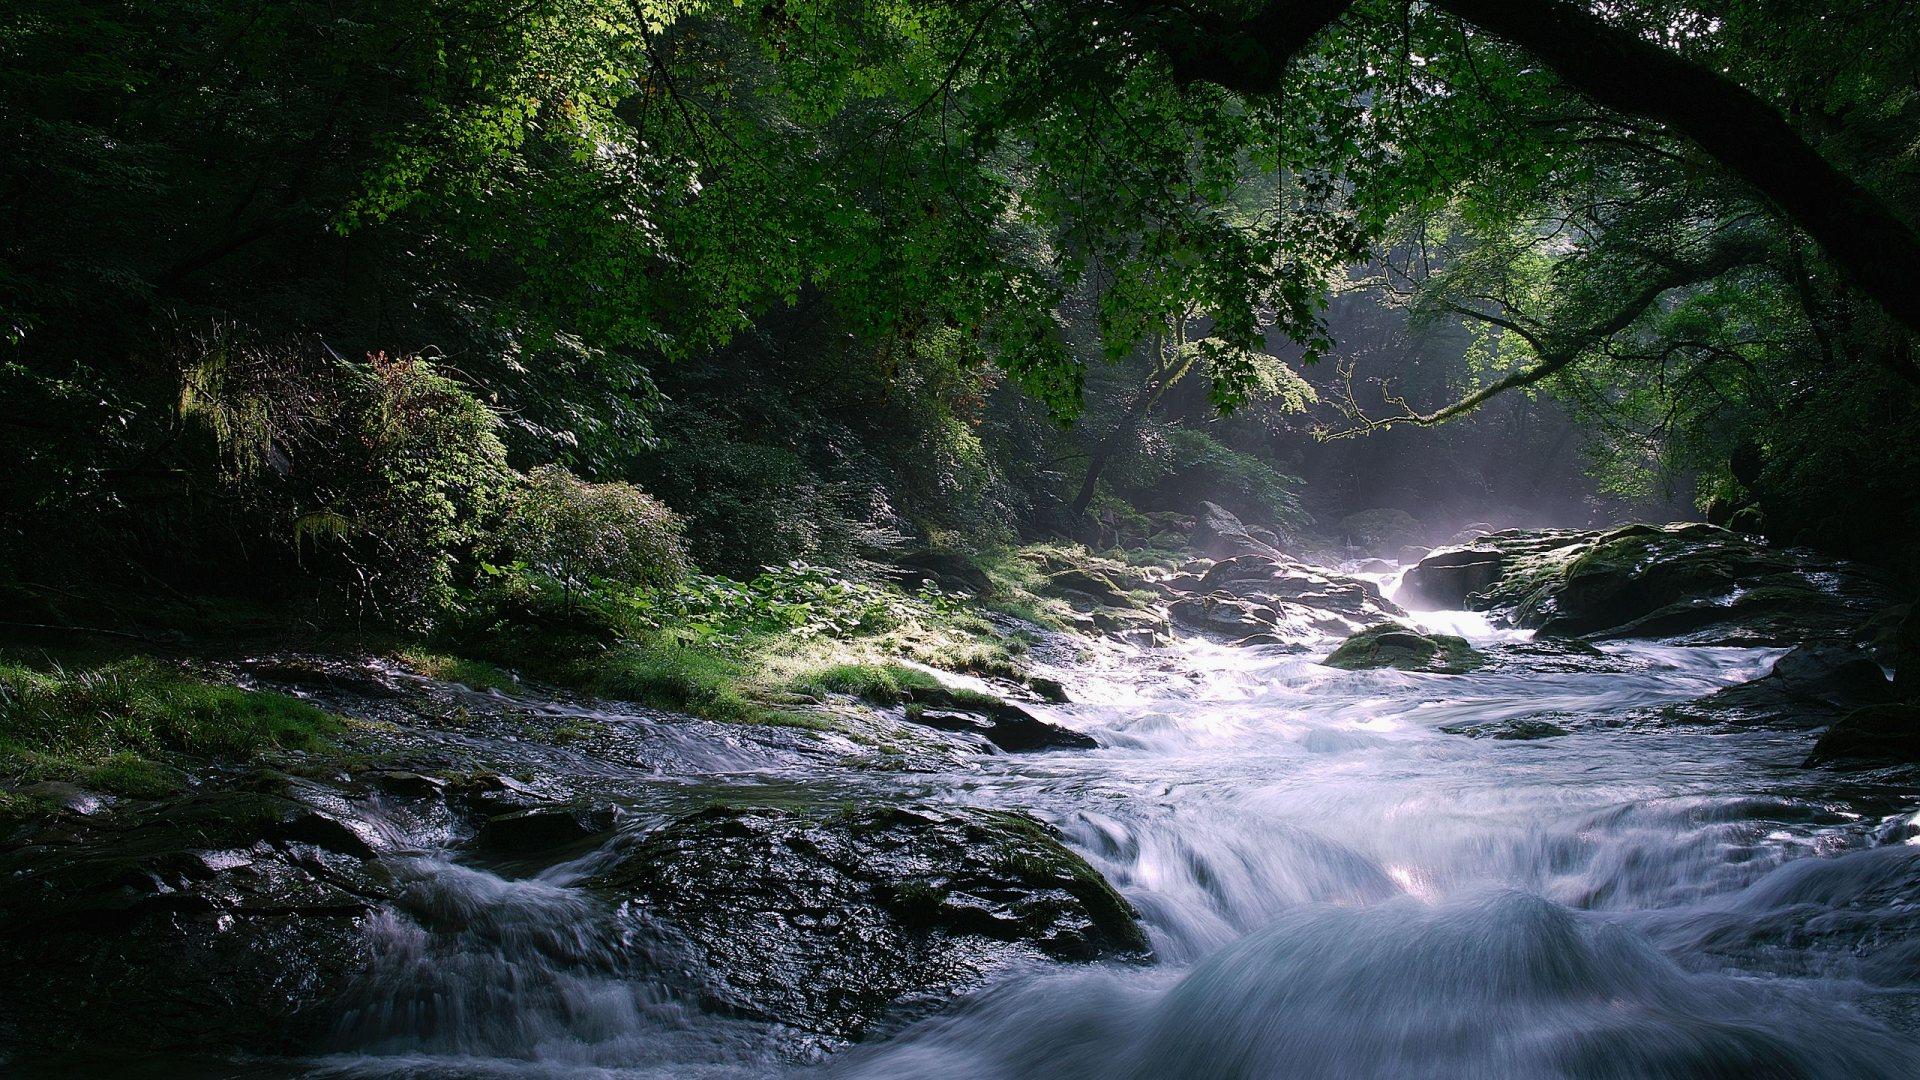 Free Download Desktop Wallpaper Nature Rivers